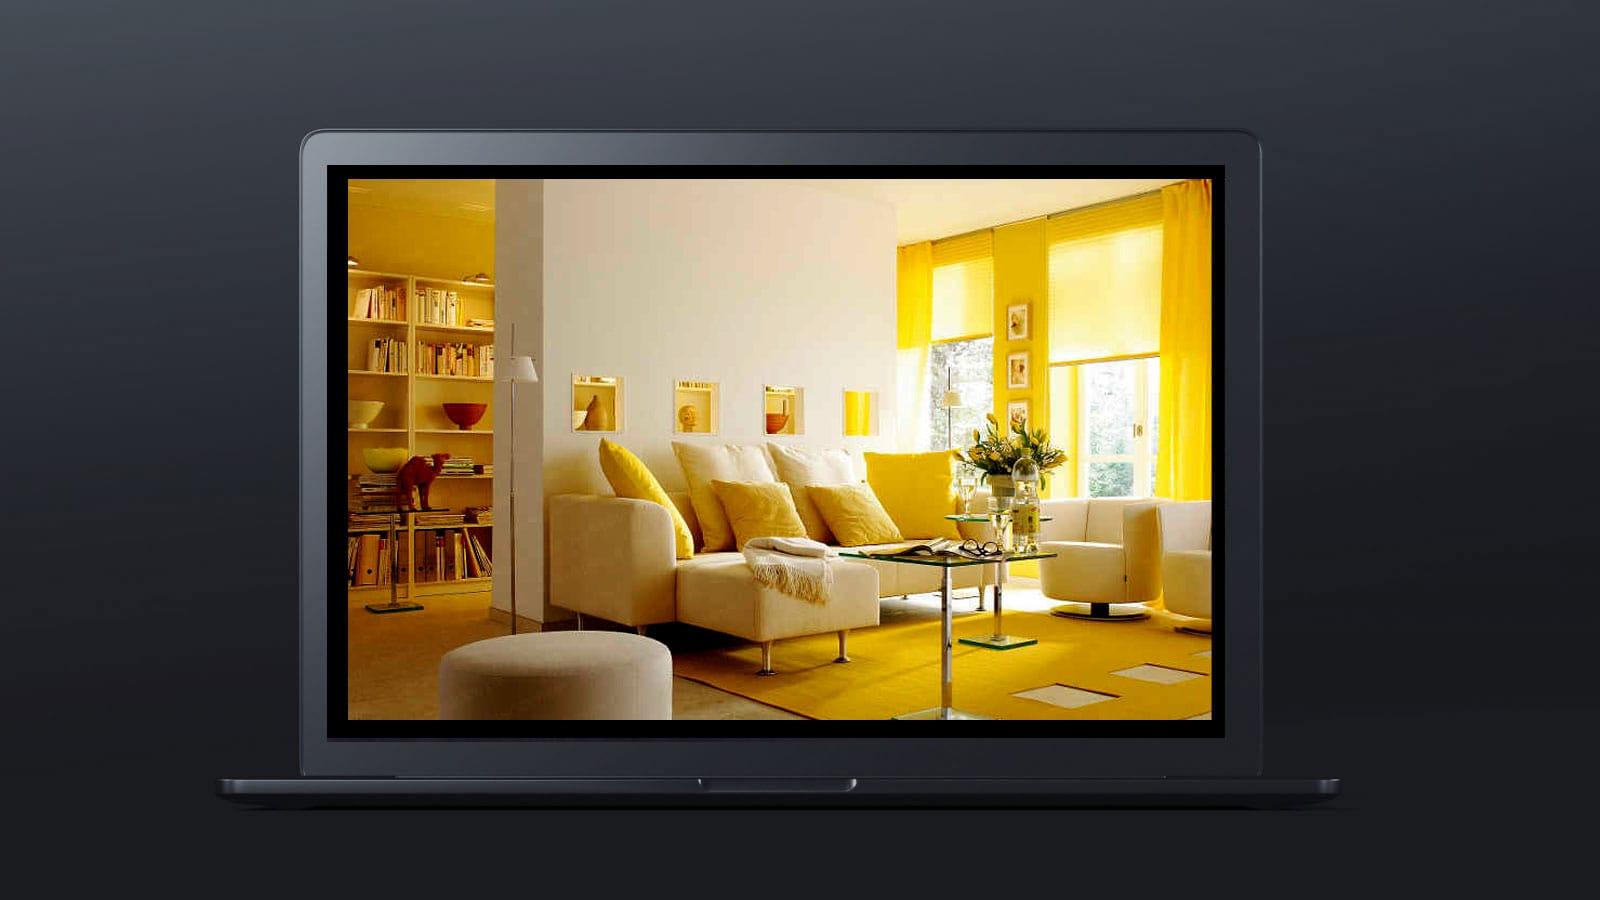 Design Color 6 - نقش رنگ و رنگ آمیزی در دکوراسیون داخلی